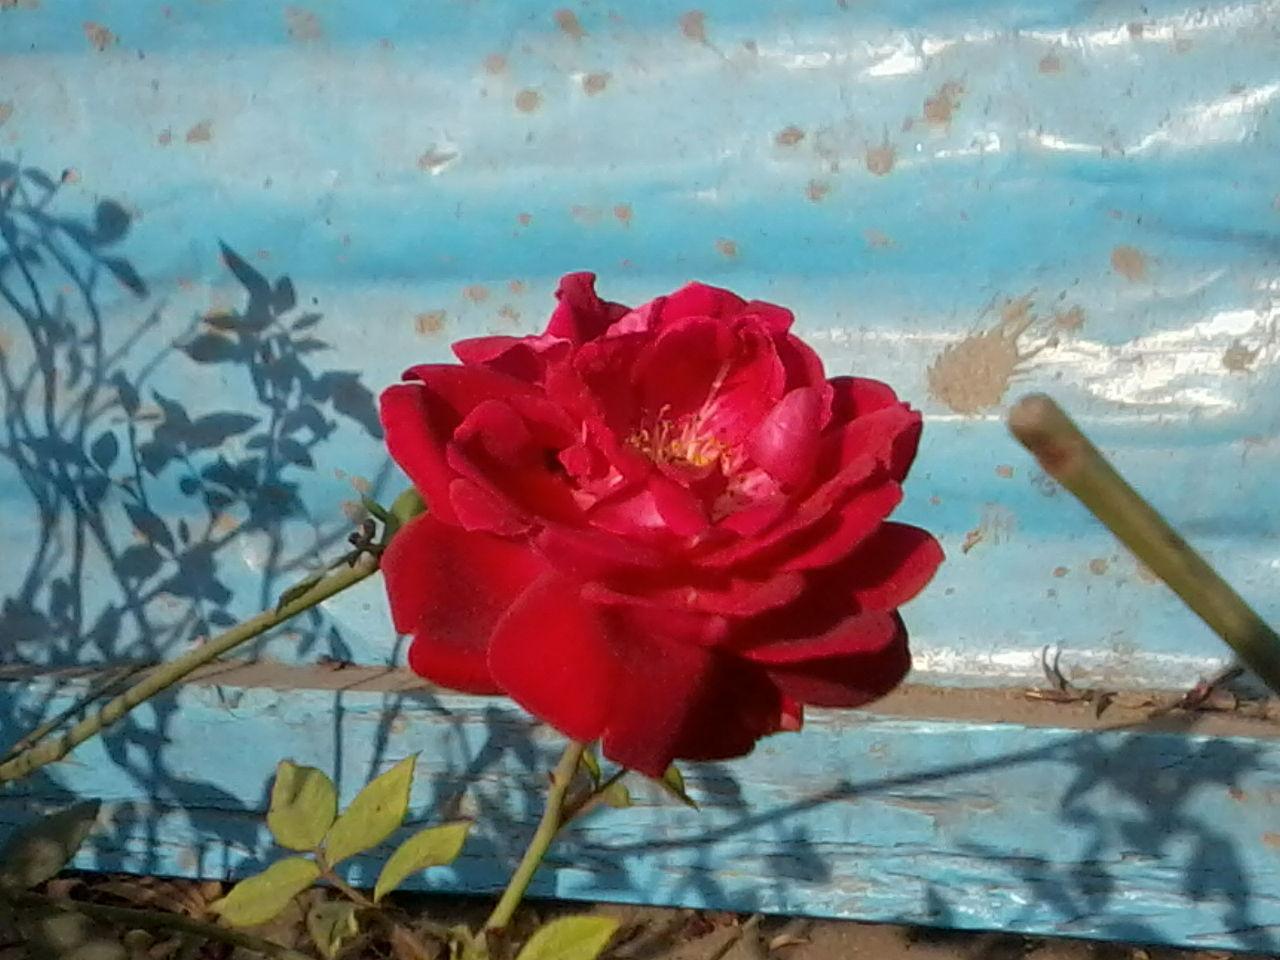 Filerose The Most Beautiful Flower Of The Worldg Wikimedia